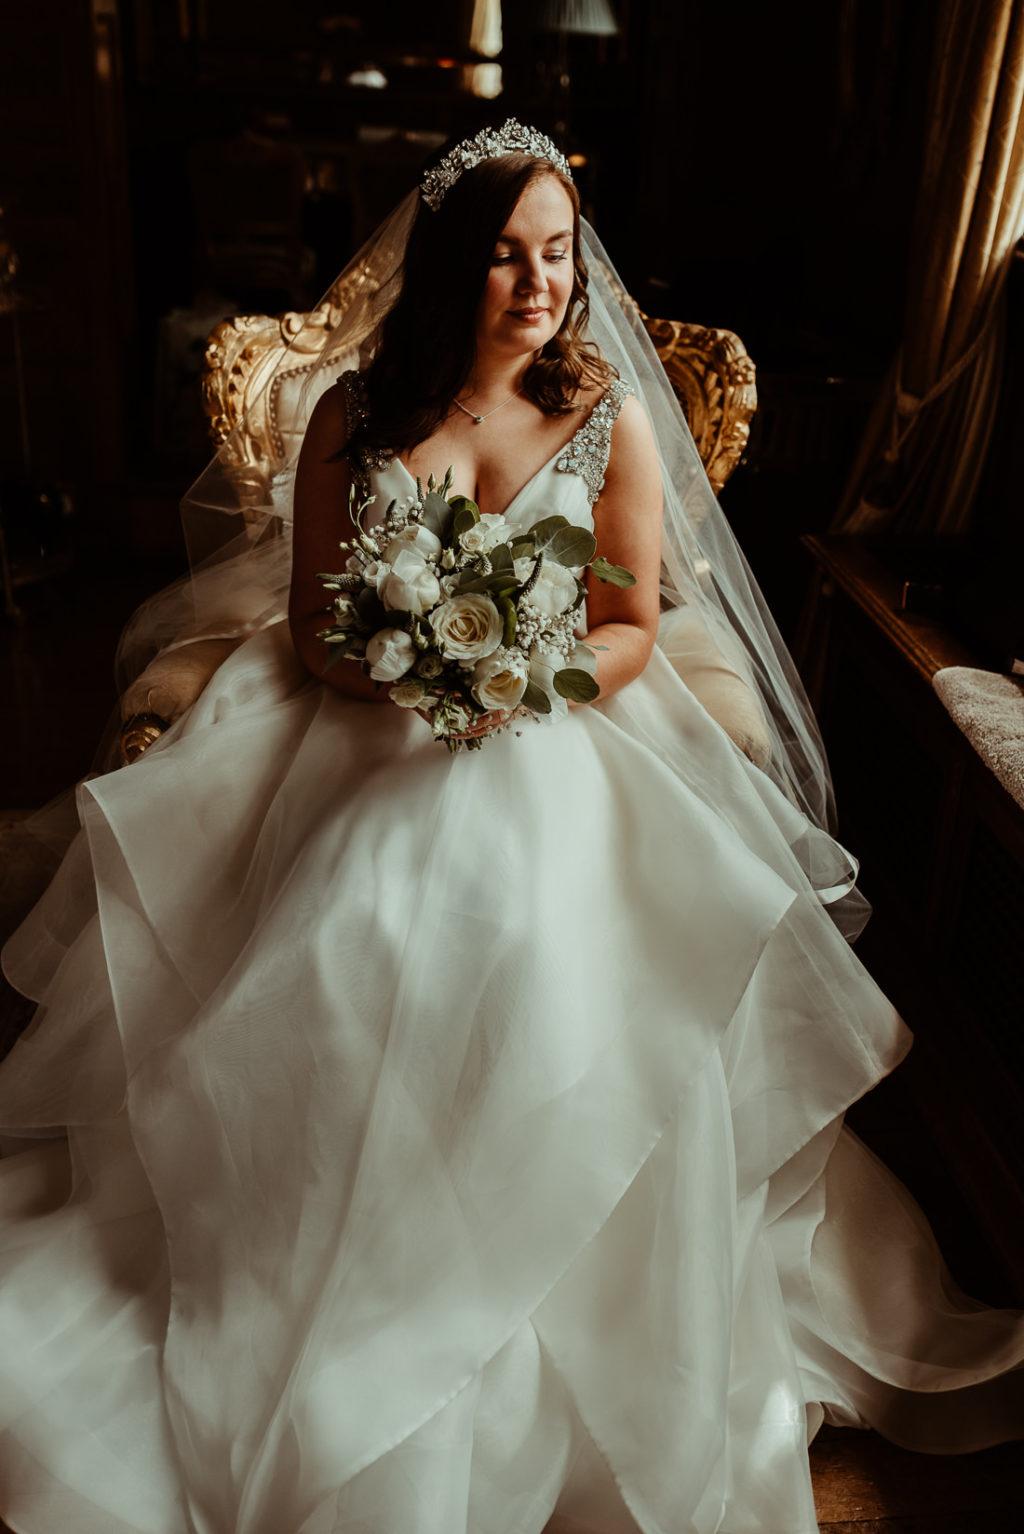 Bride at Hengrave Hall